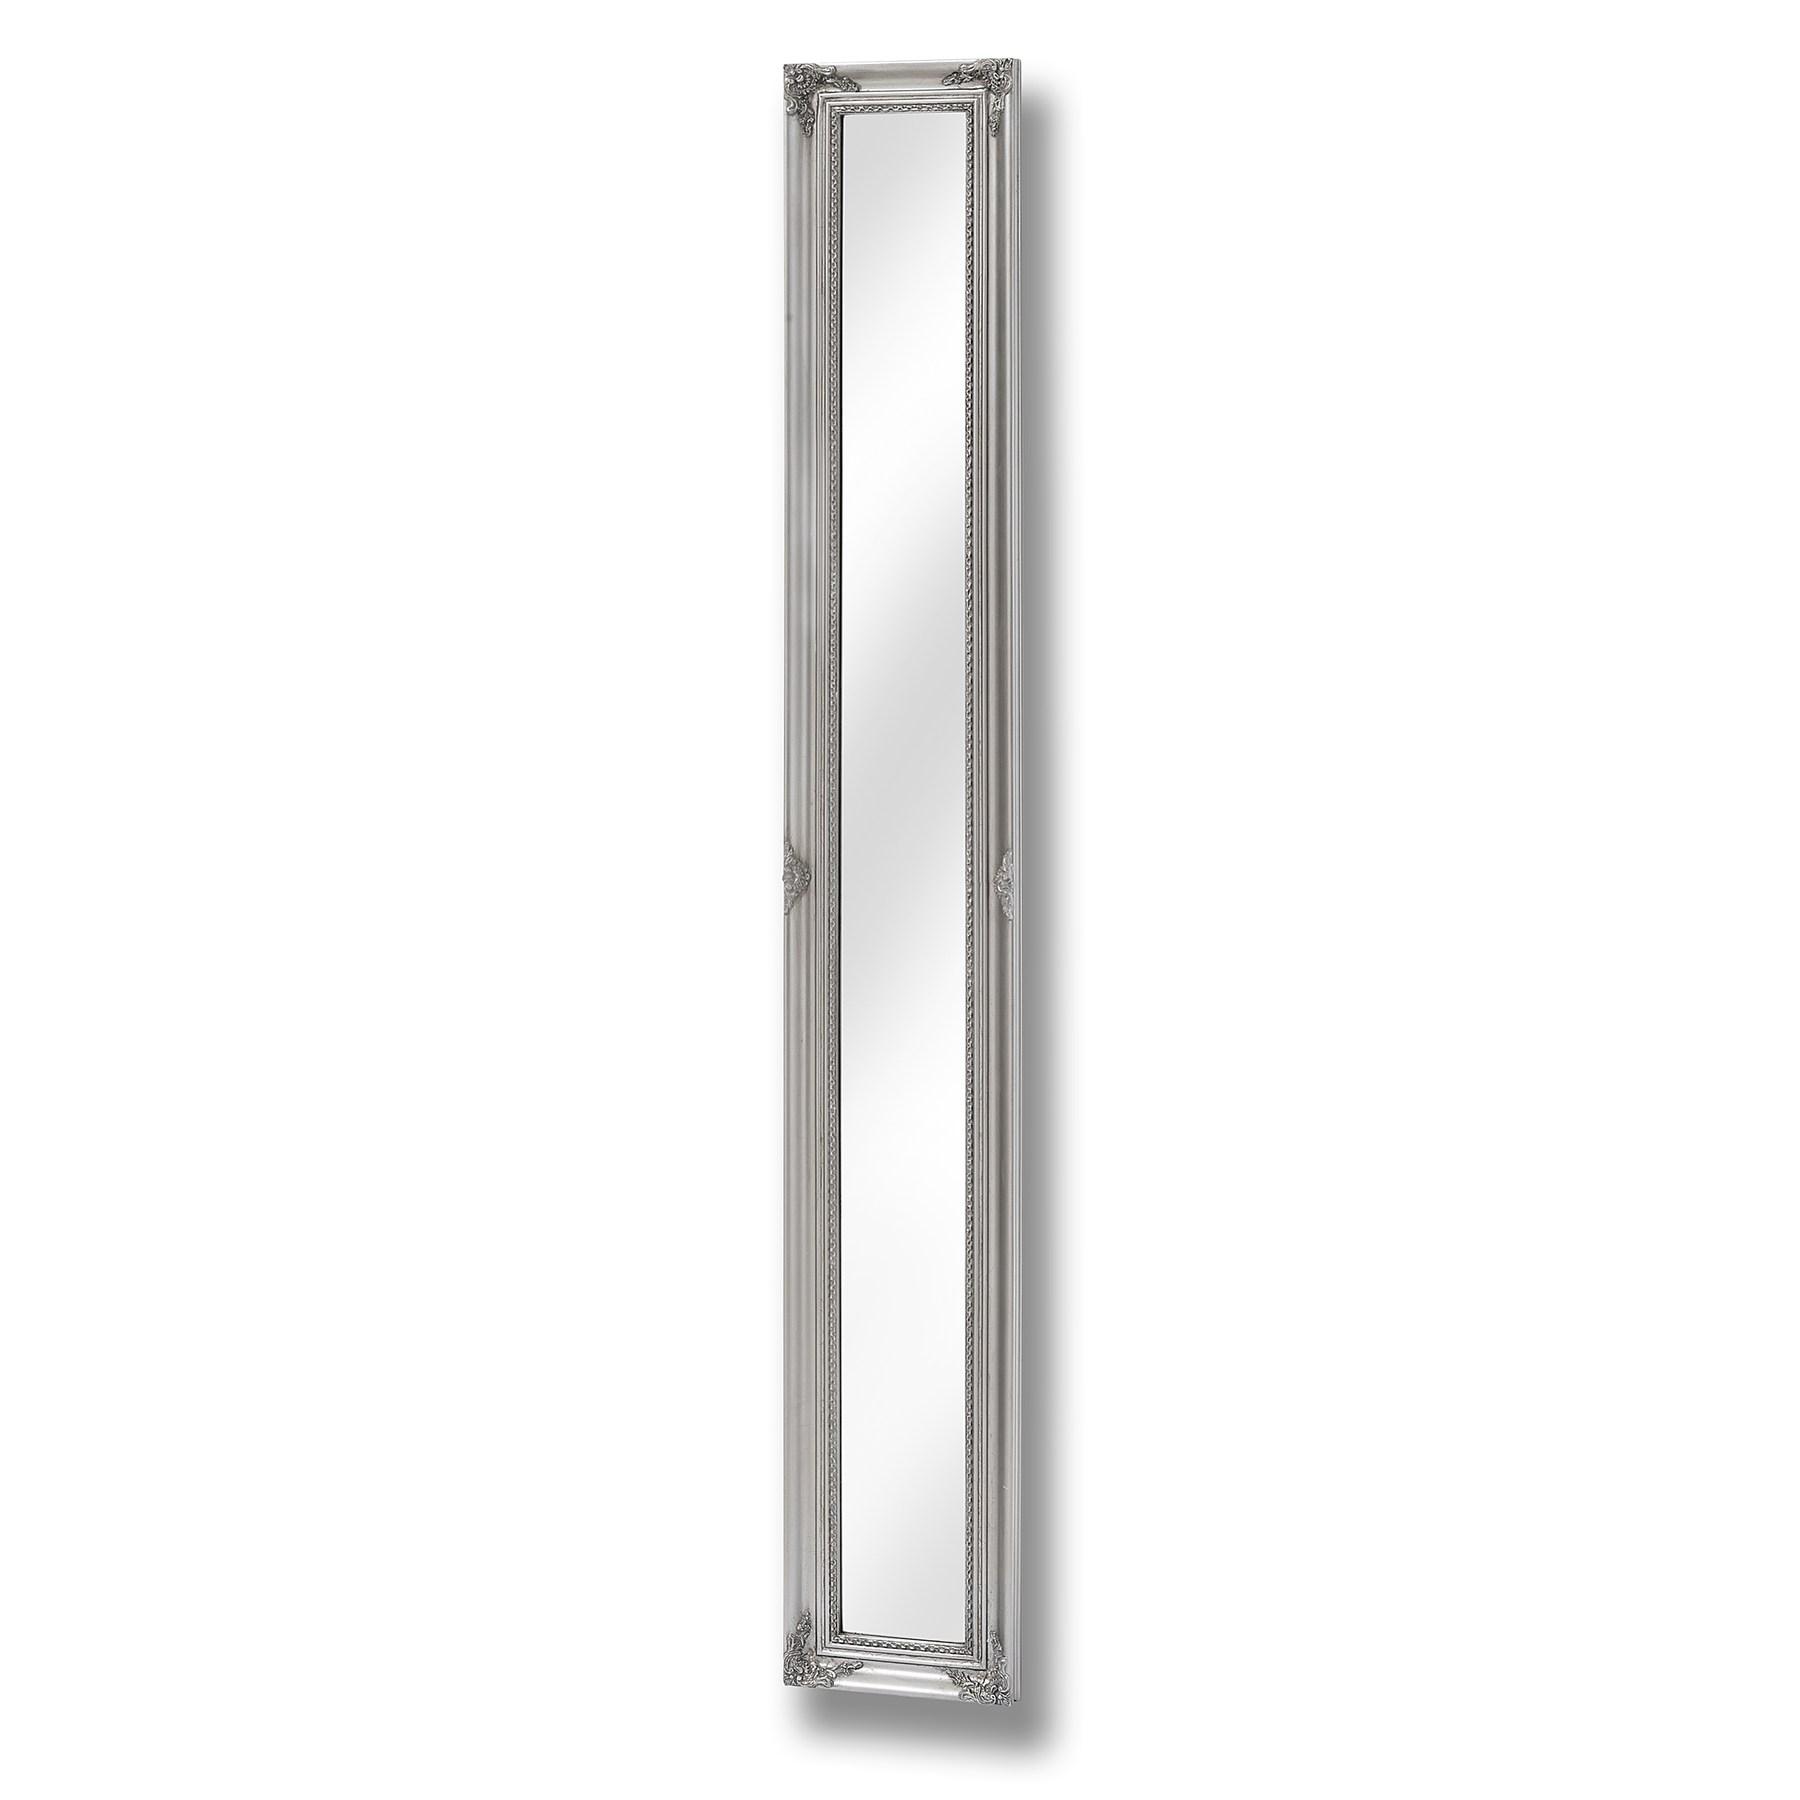 Baroque Slimline Antique Silver Full Length Mirror - Image 1